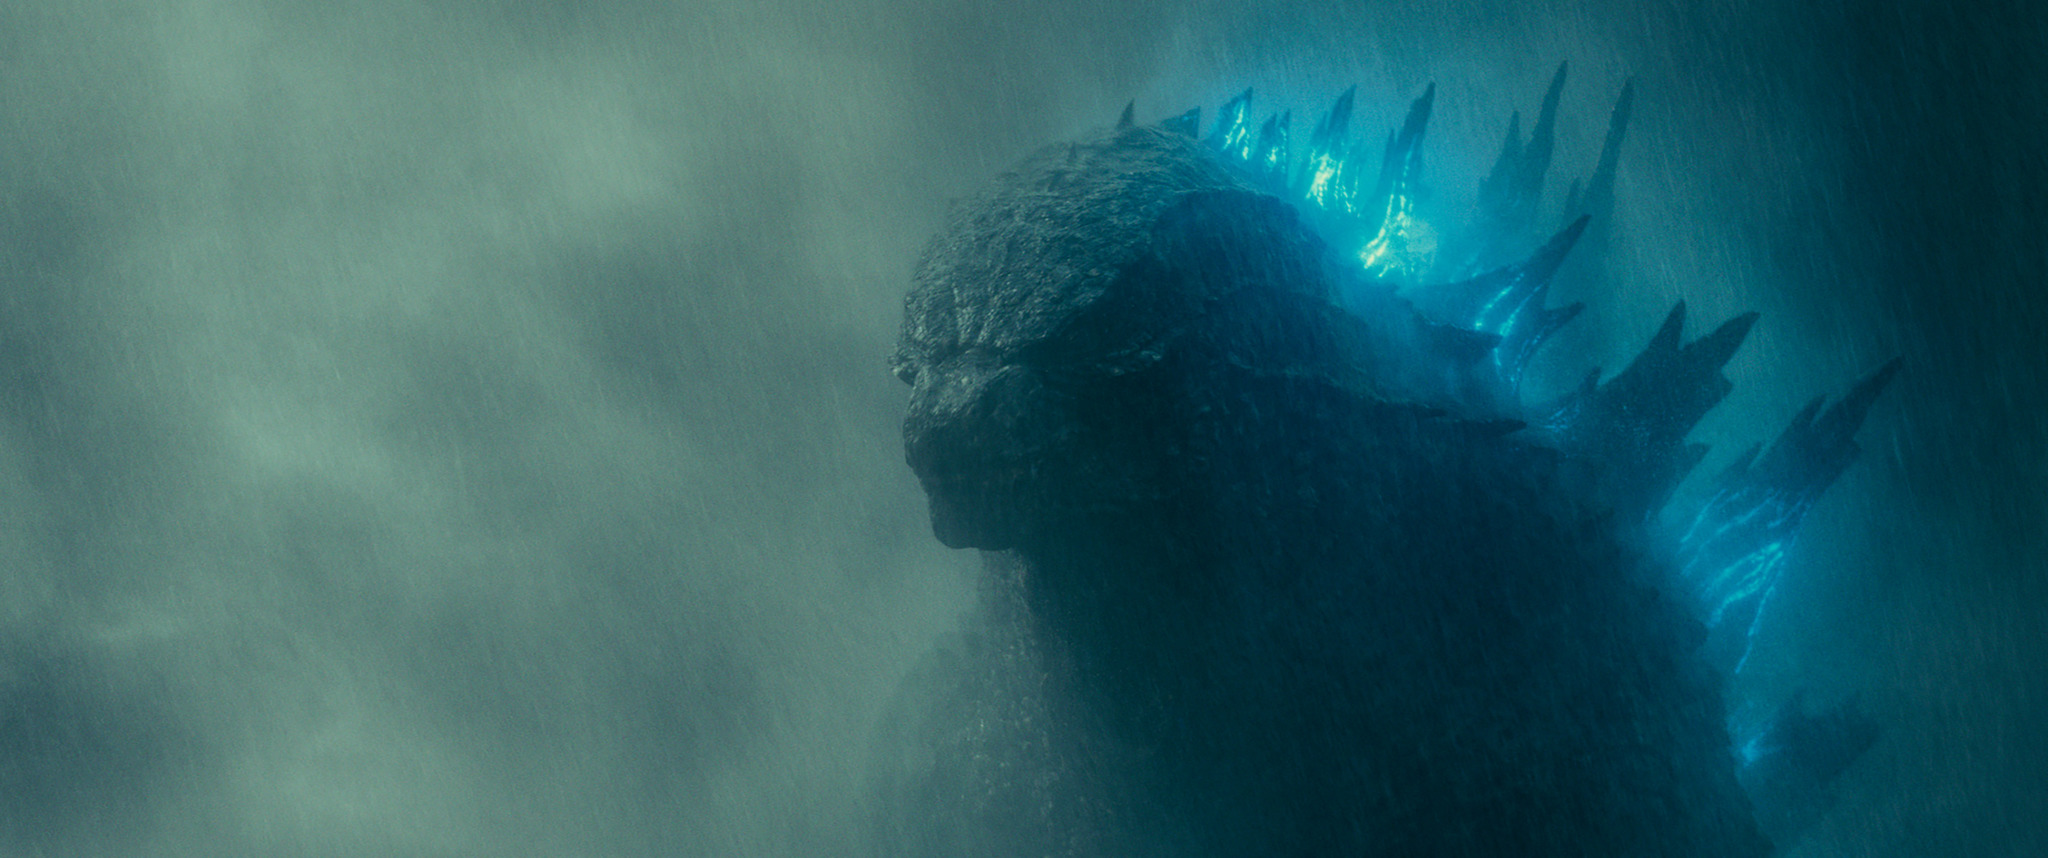 Godzilla King Of The Monsters 2019 Photo Gallery Imdb